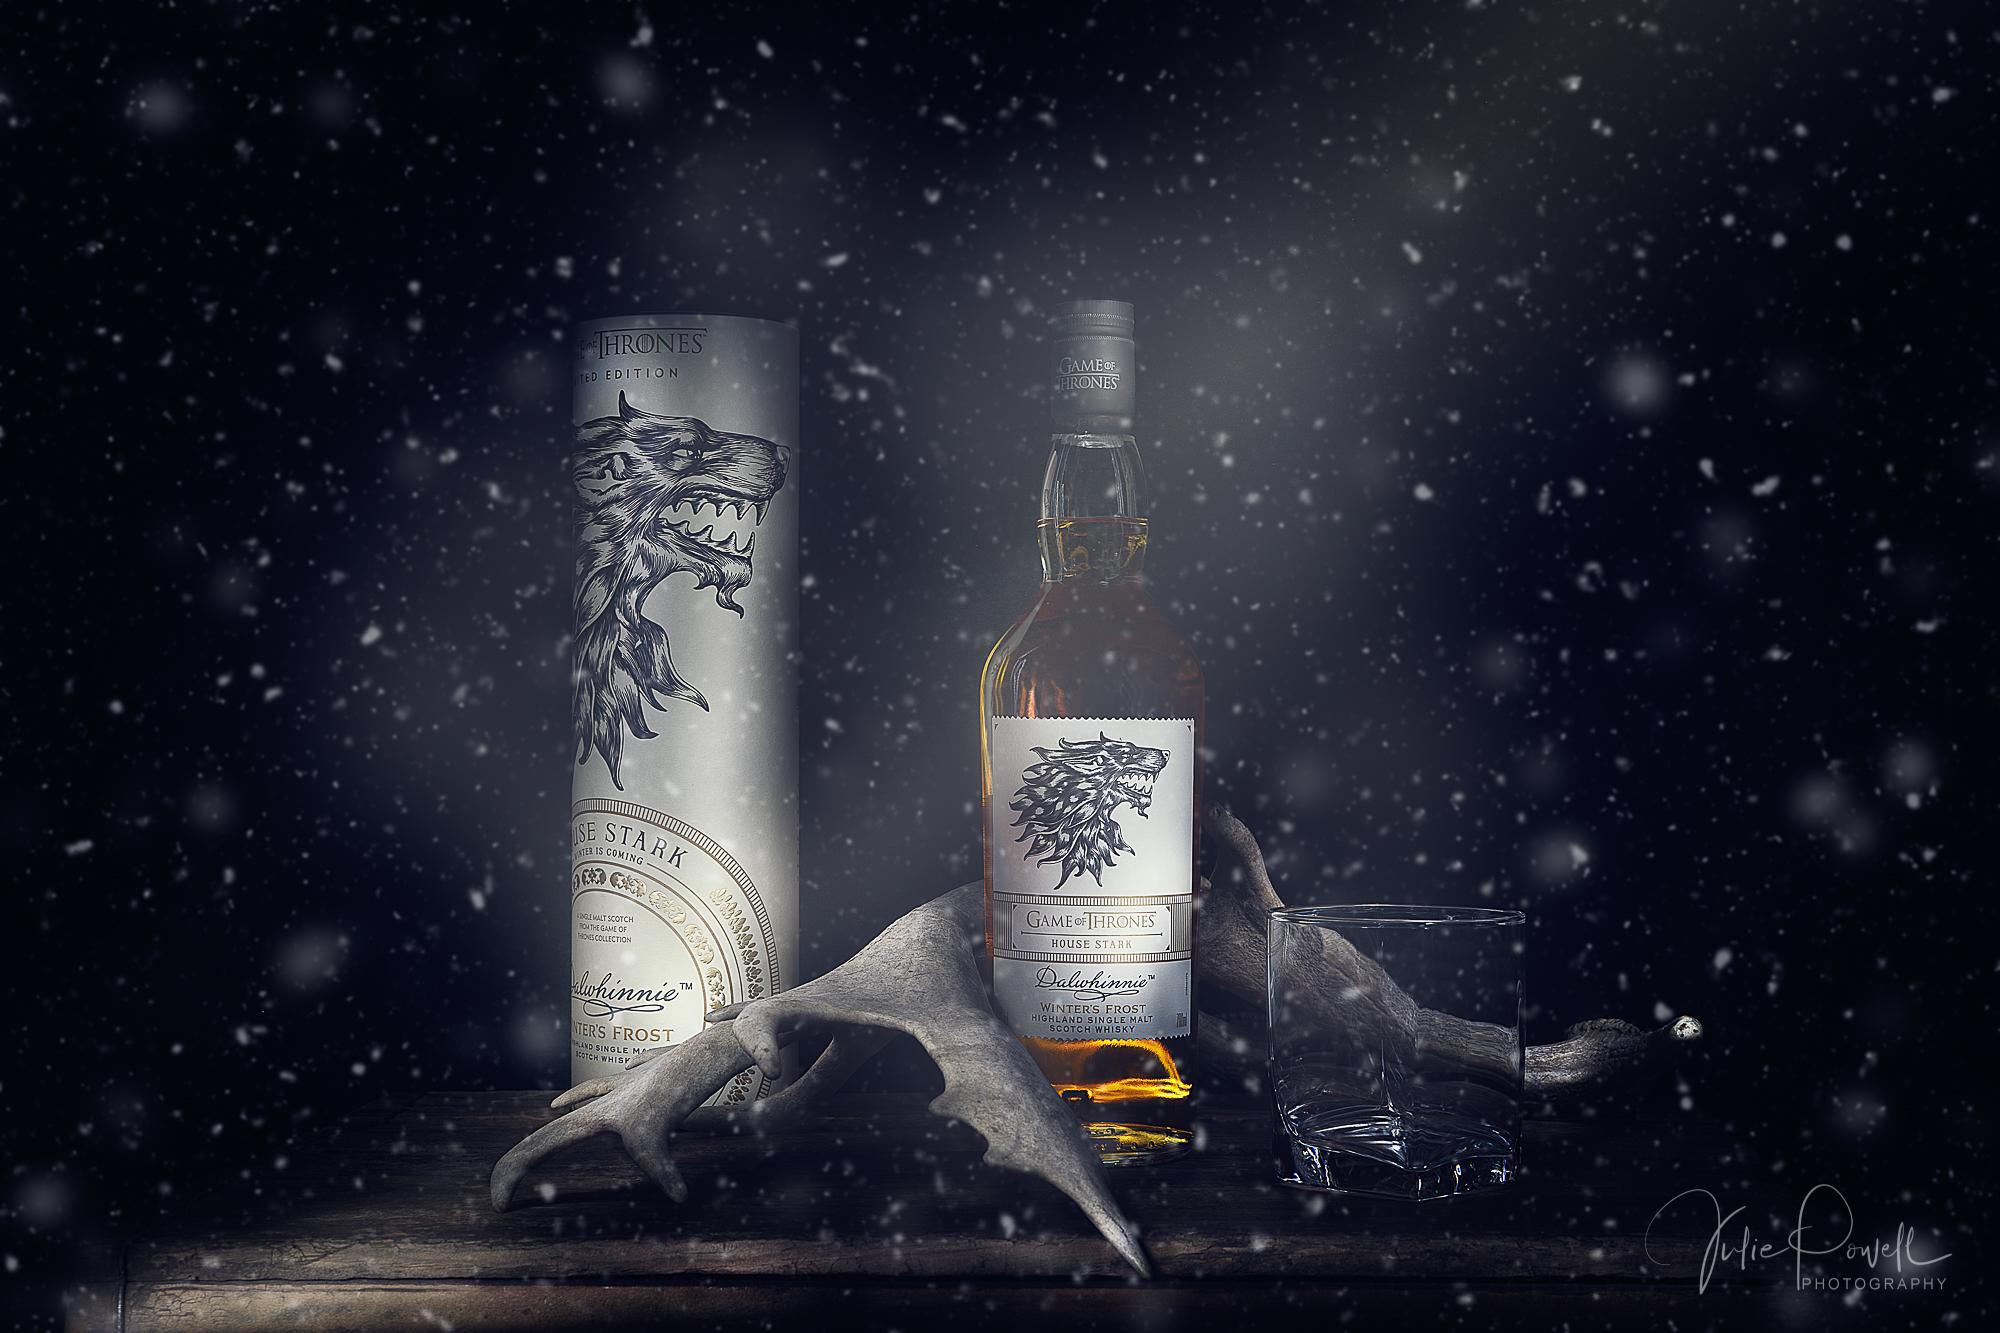 JuliePowell_Winter is Coming.jpg